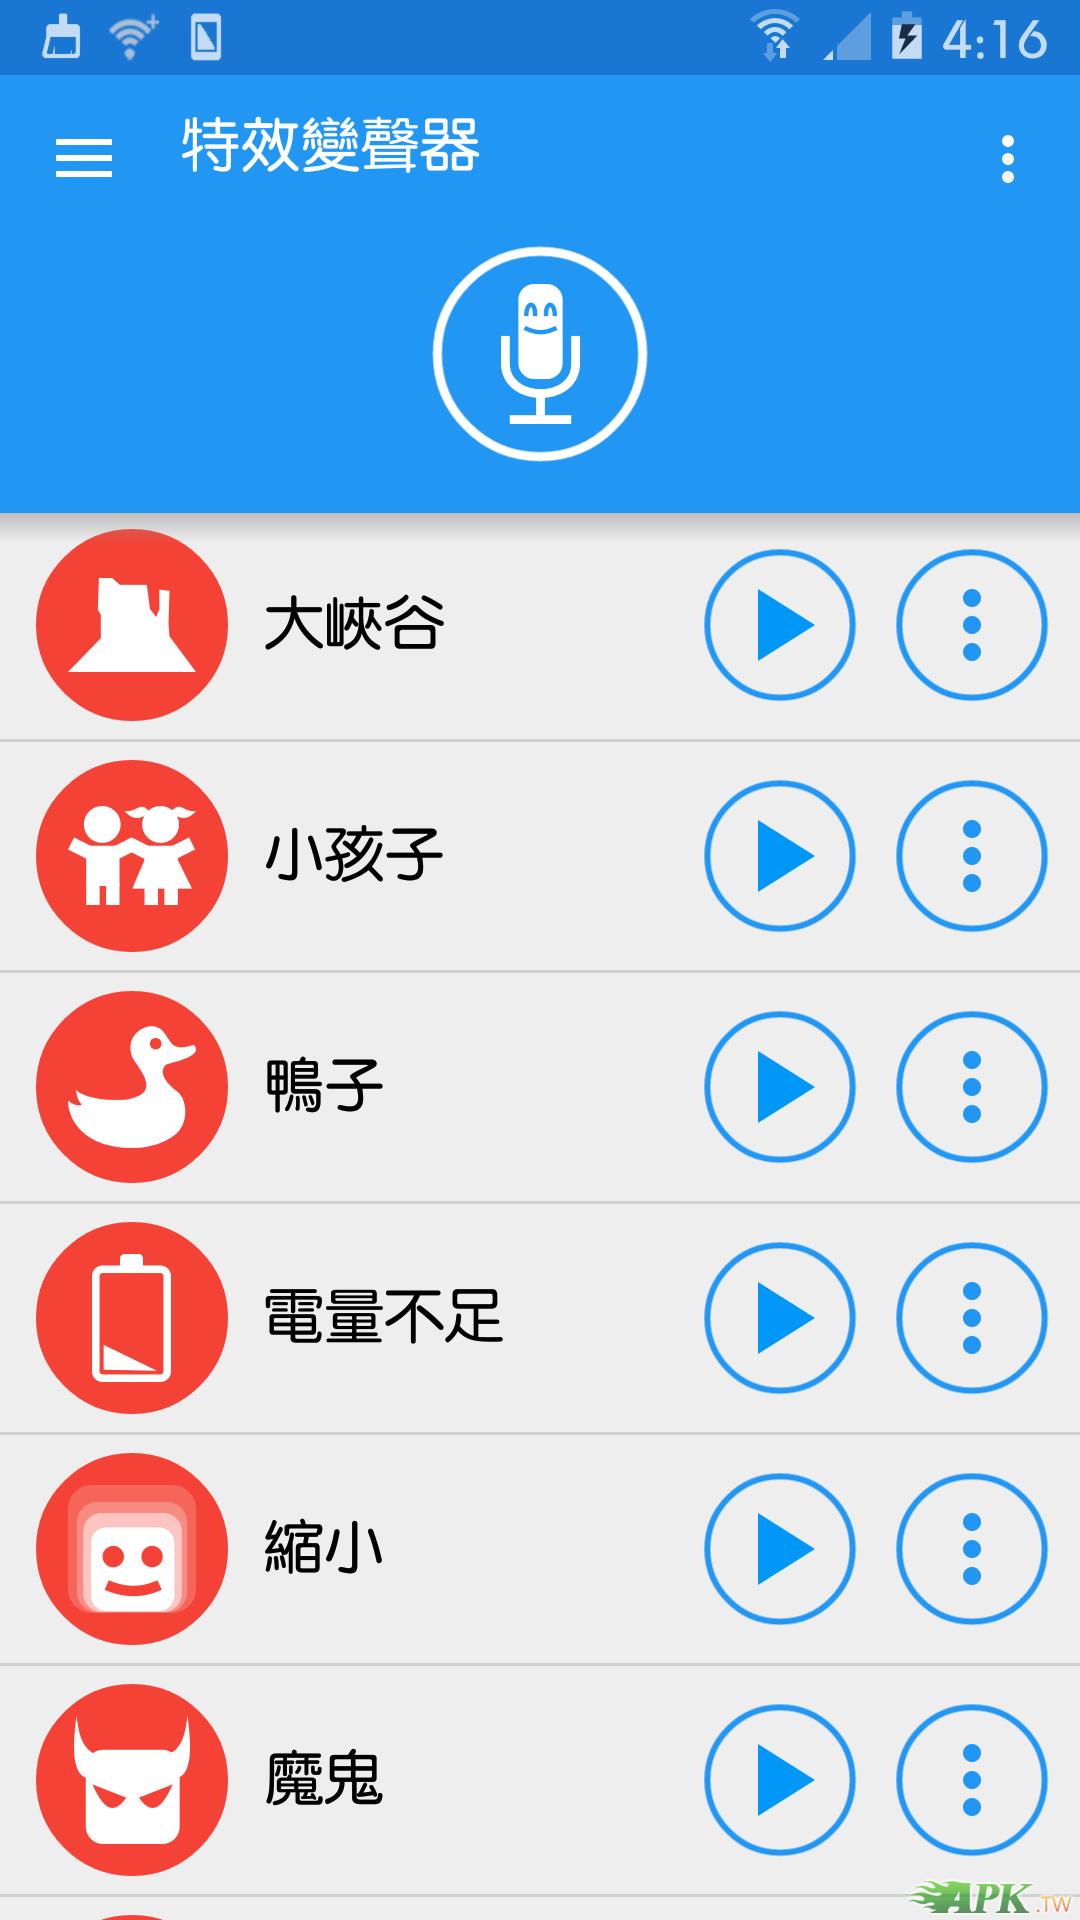 Screenshot_2015-04-25-04-16-45.png